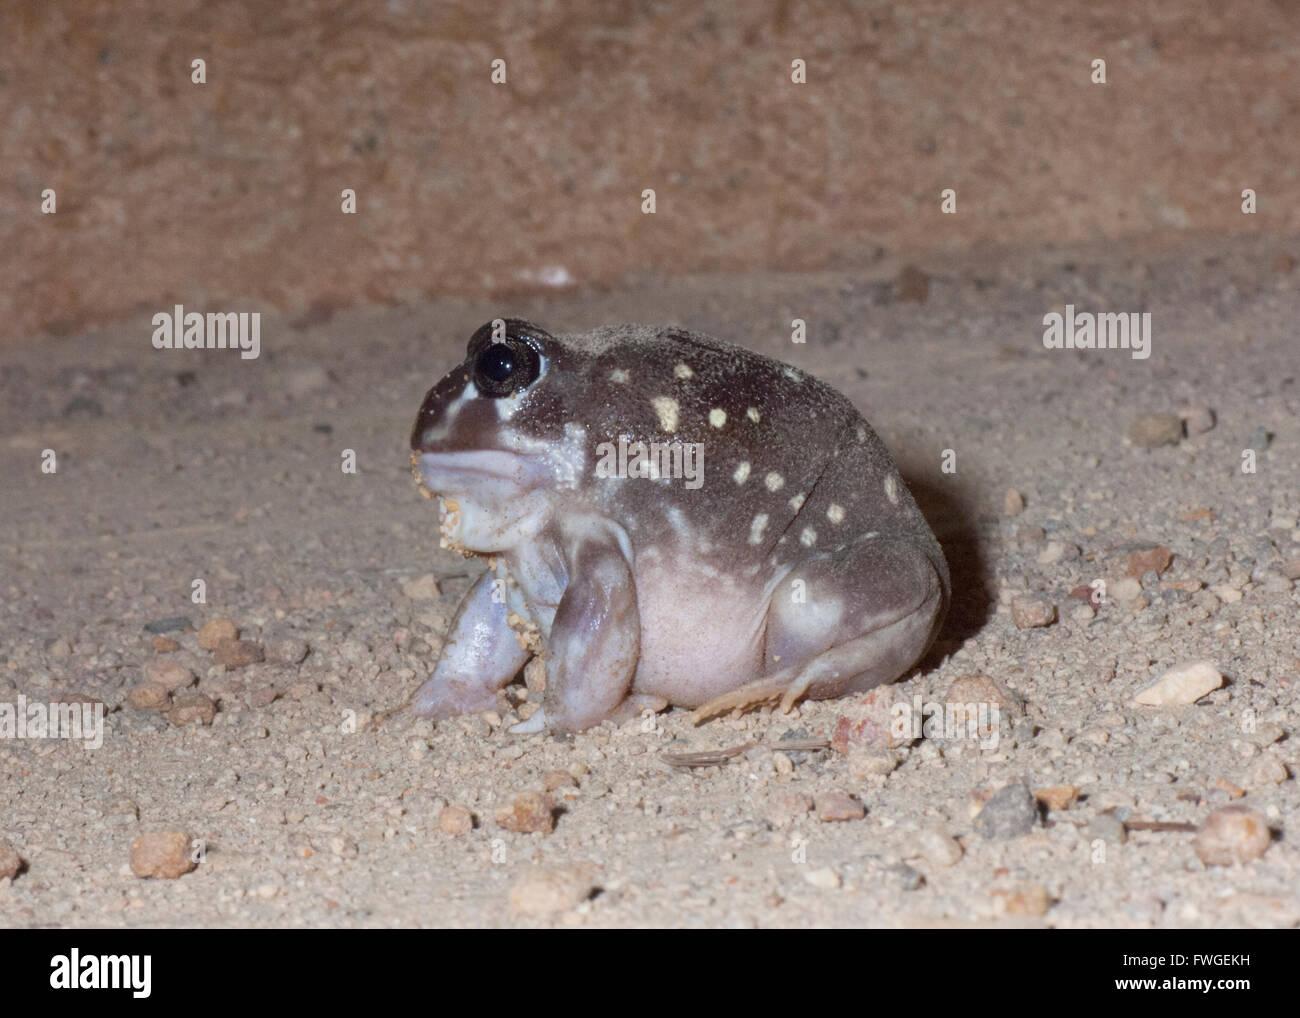 Western Spotted Frog (Heleioporus albopunctatus), Western Australia, Australia Stock Photo